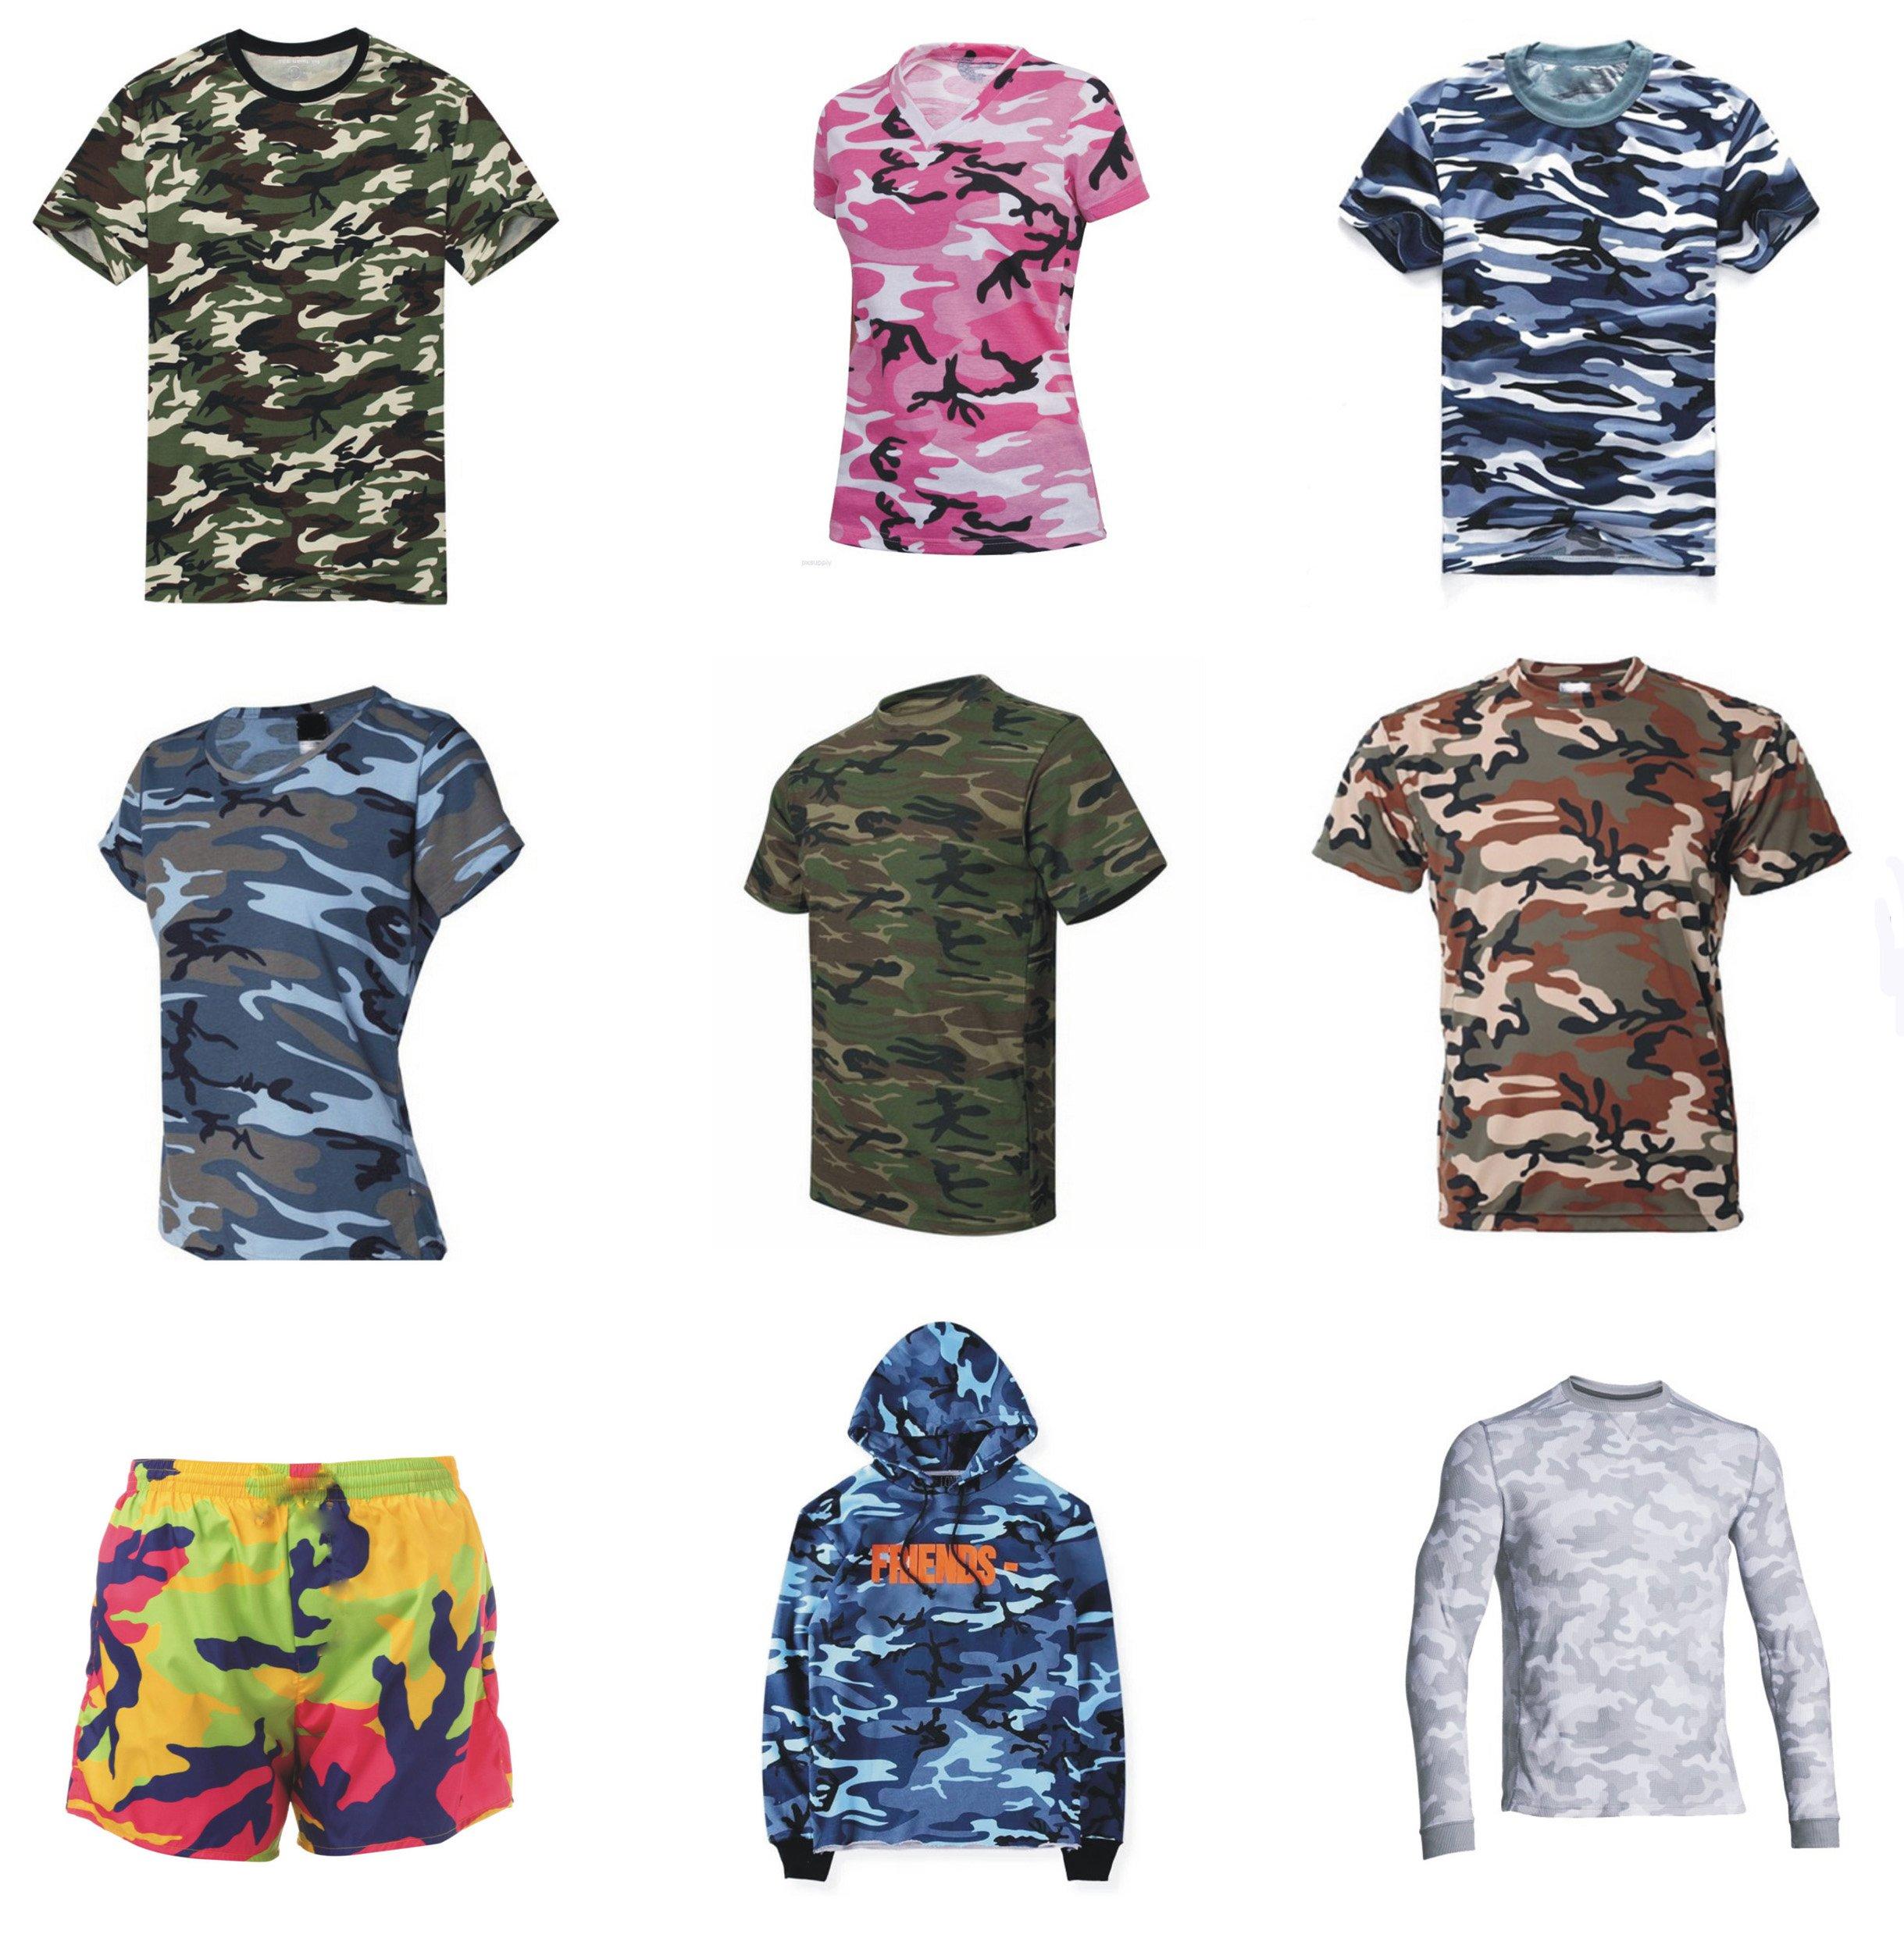 2d928c75cdb Home Products Teamwear Tshirts Custom Sublimation Camo Shirts Design.   